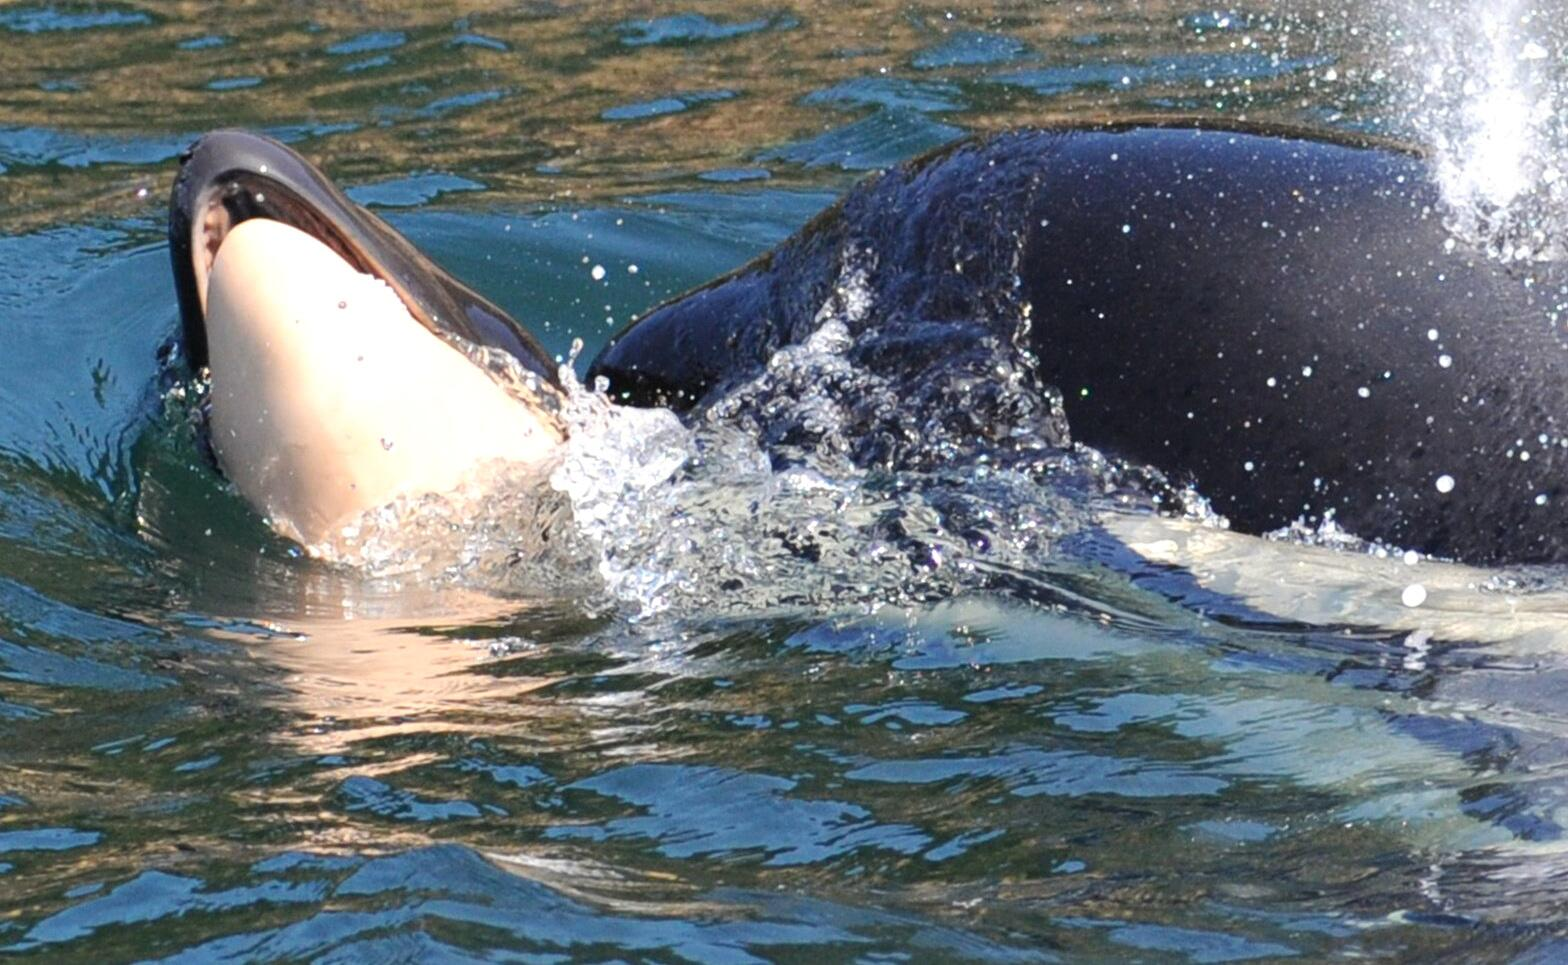 Bild zu Orca-Wal schleppt totes Junges